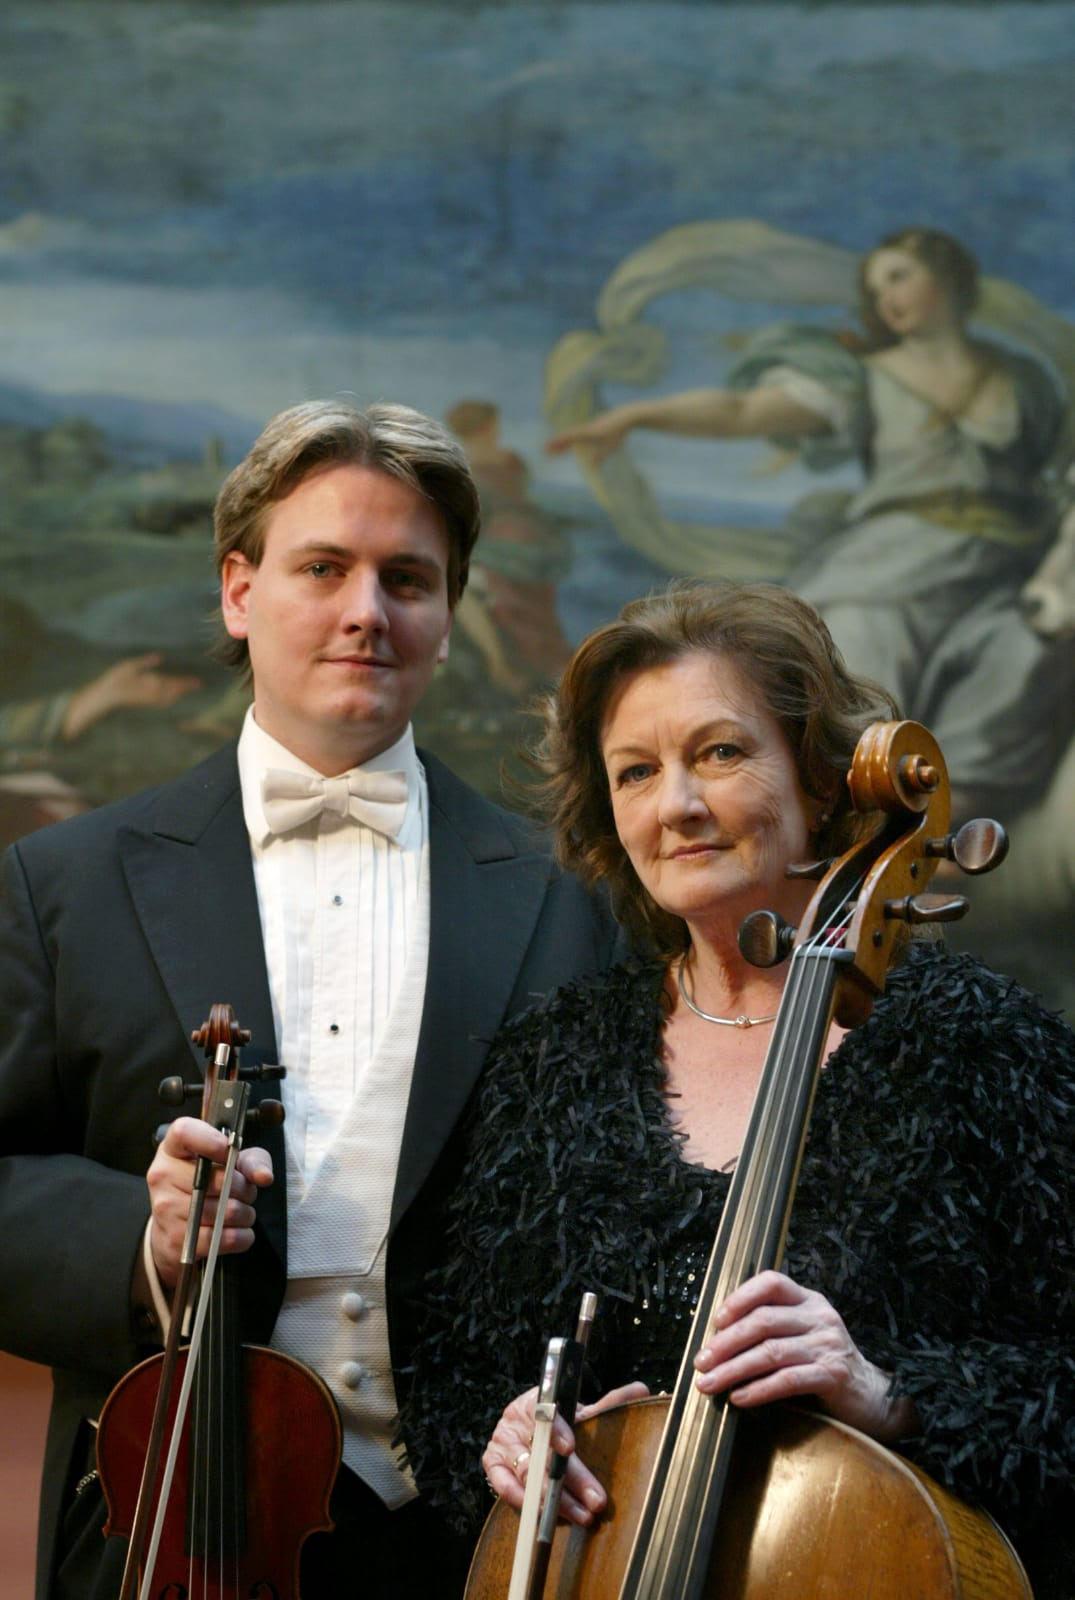 Moya O'Grady & David O'Doherty